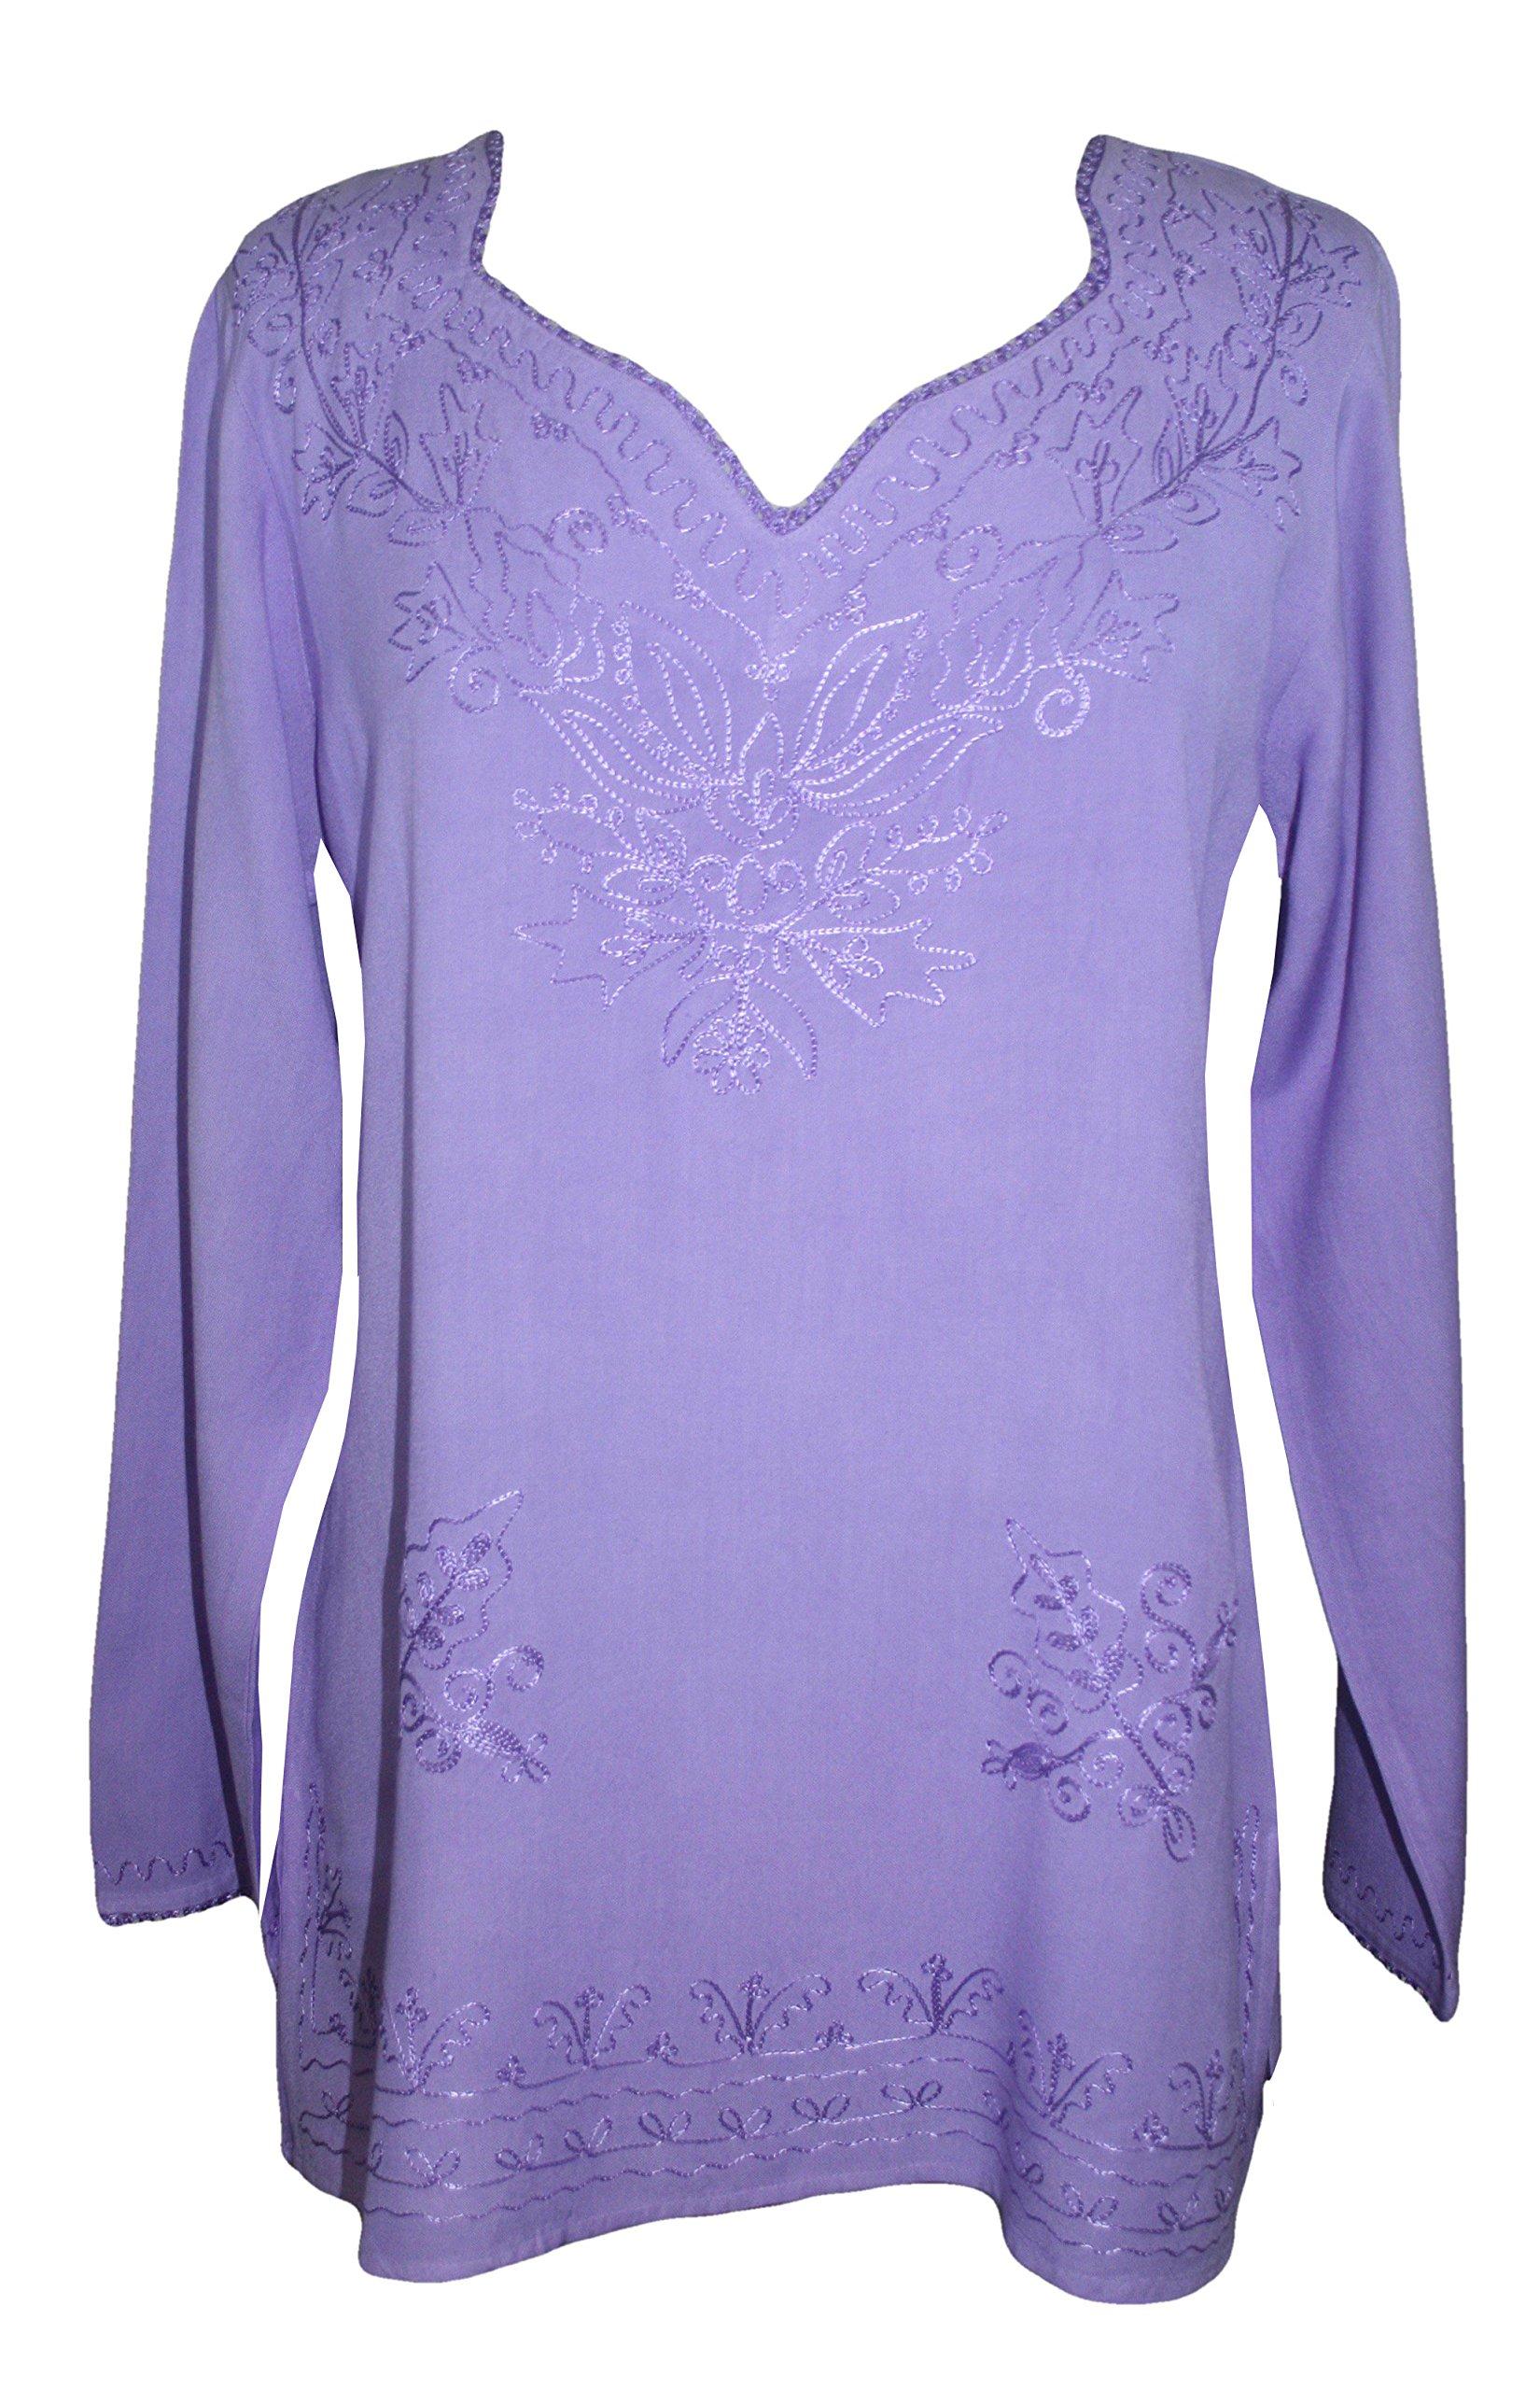 720 B Medieval Renaissance Embroidered Top Blouse (XL/1X, Lavender)